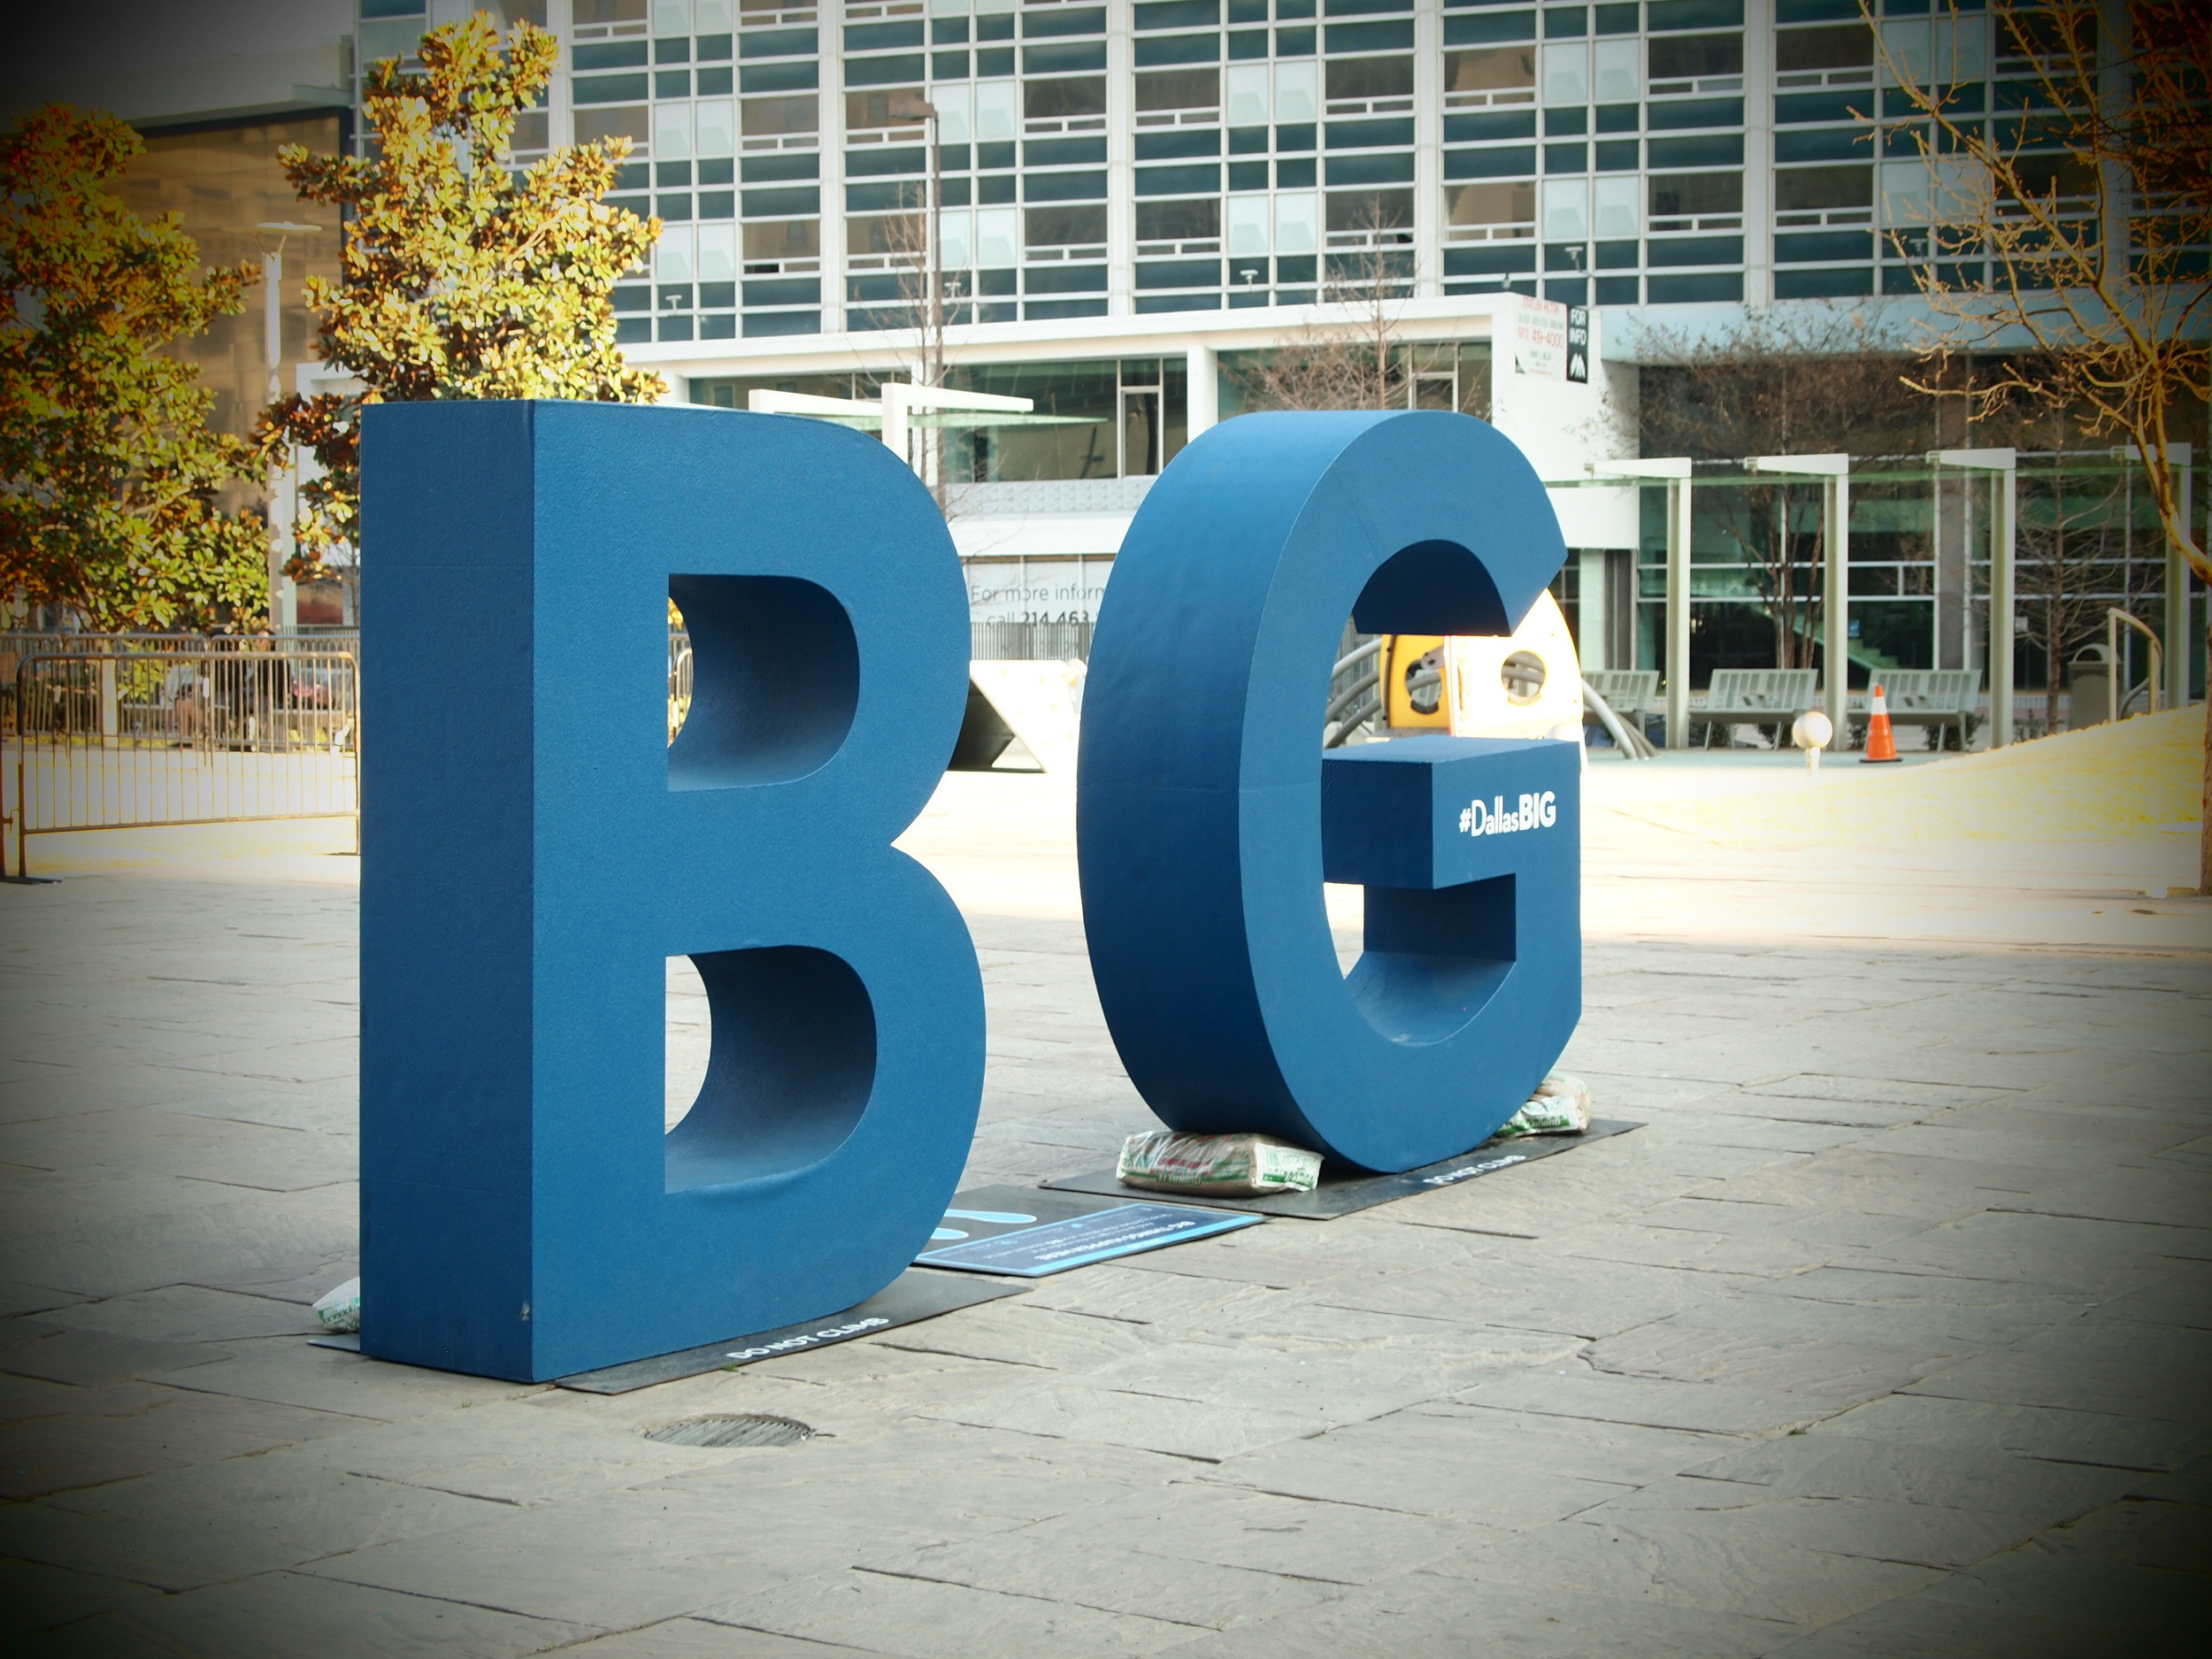 #DallasBIG